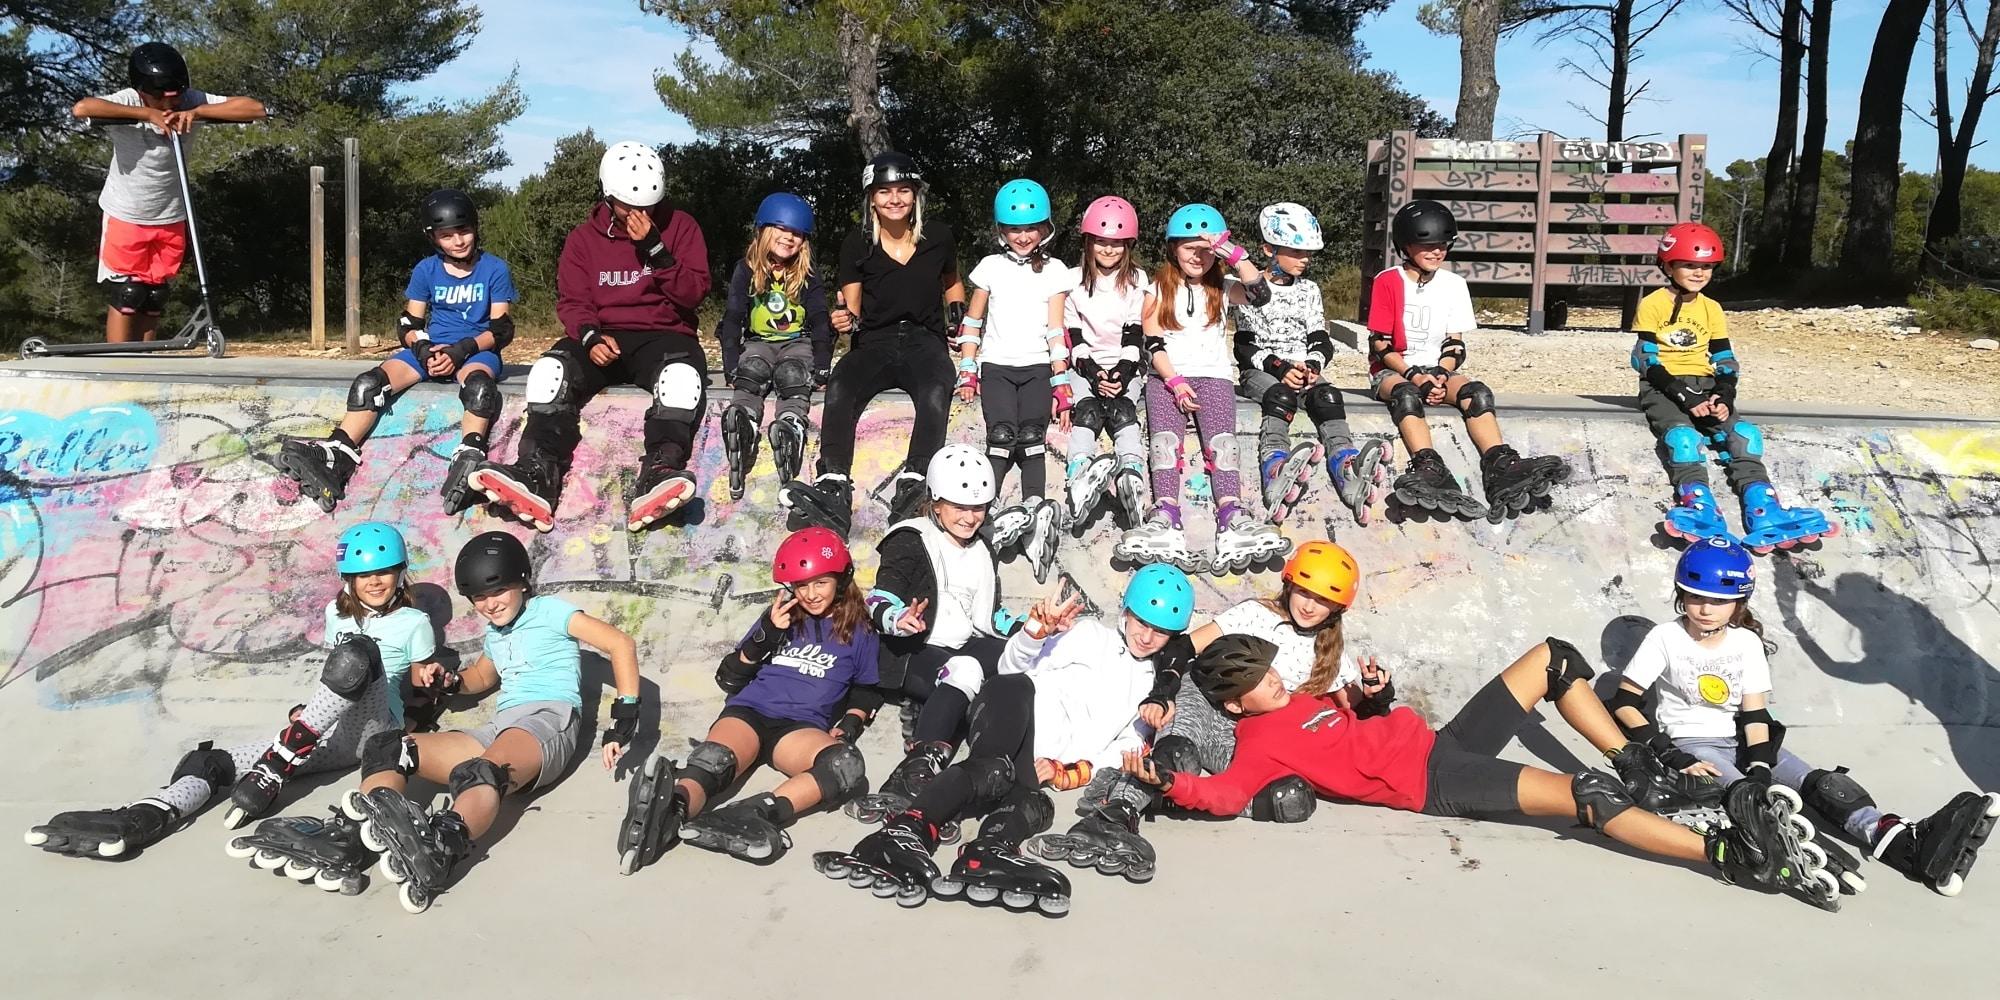 Portes ouvertes Skate Park avec Armelle TISLER - USV